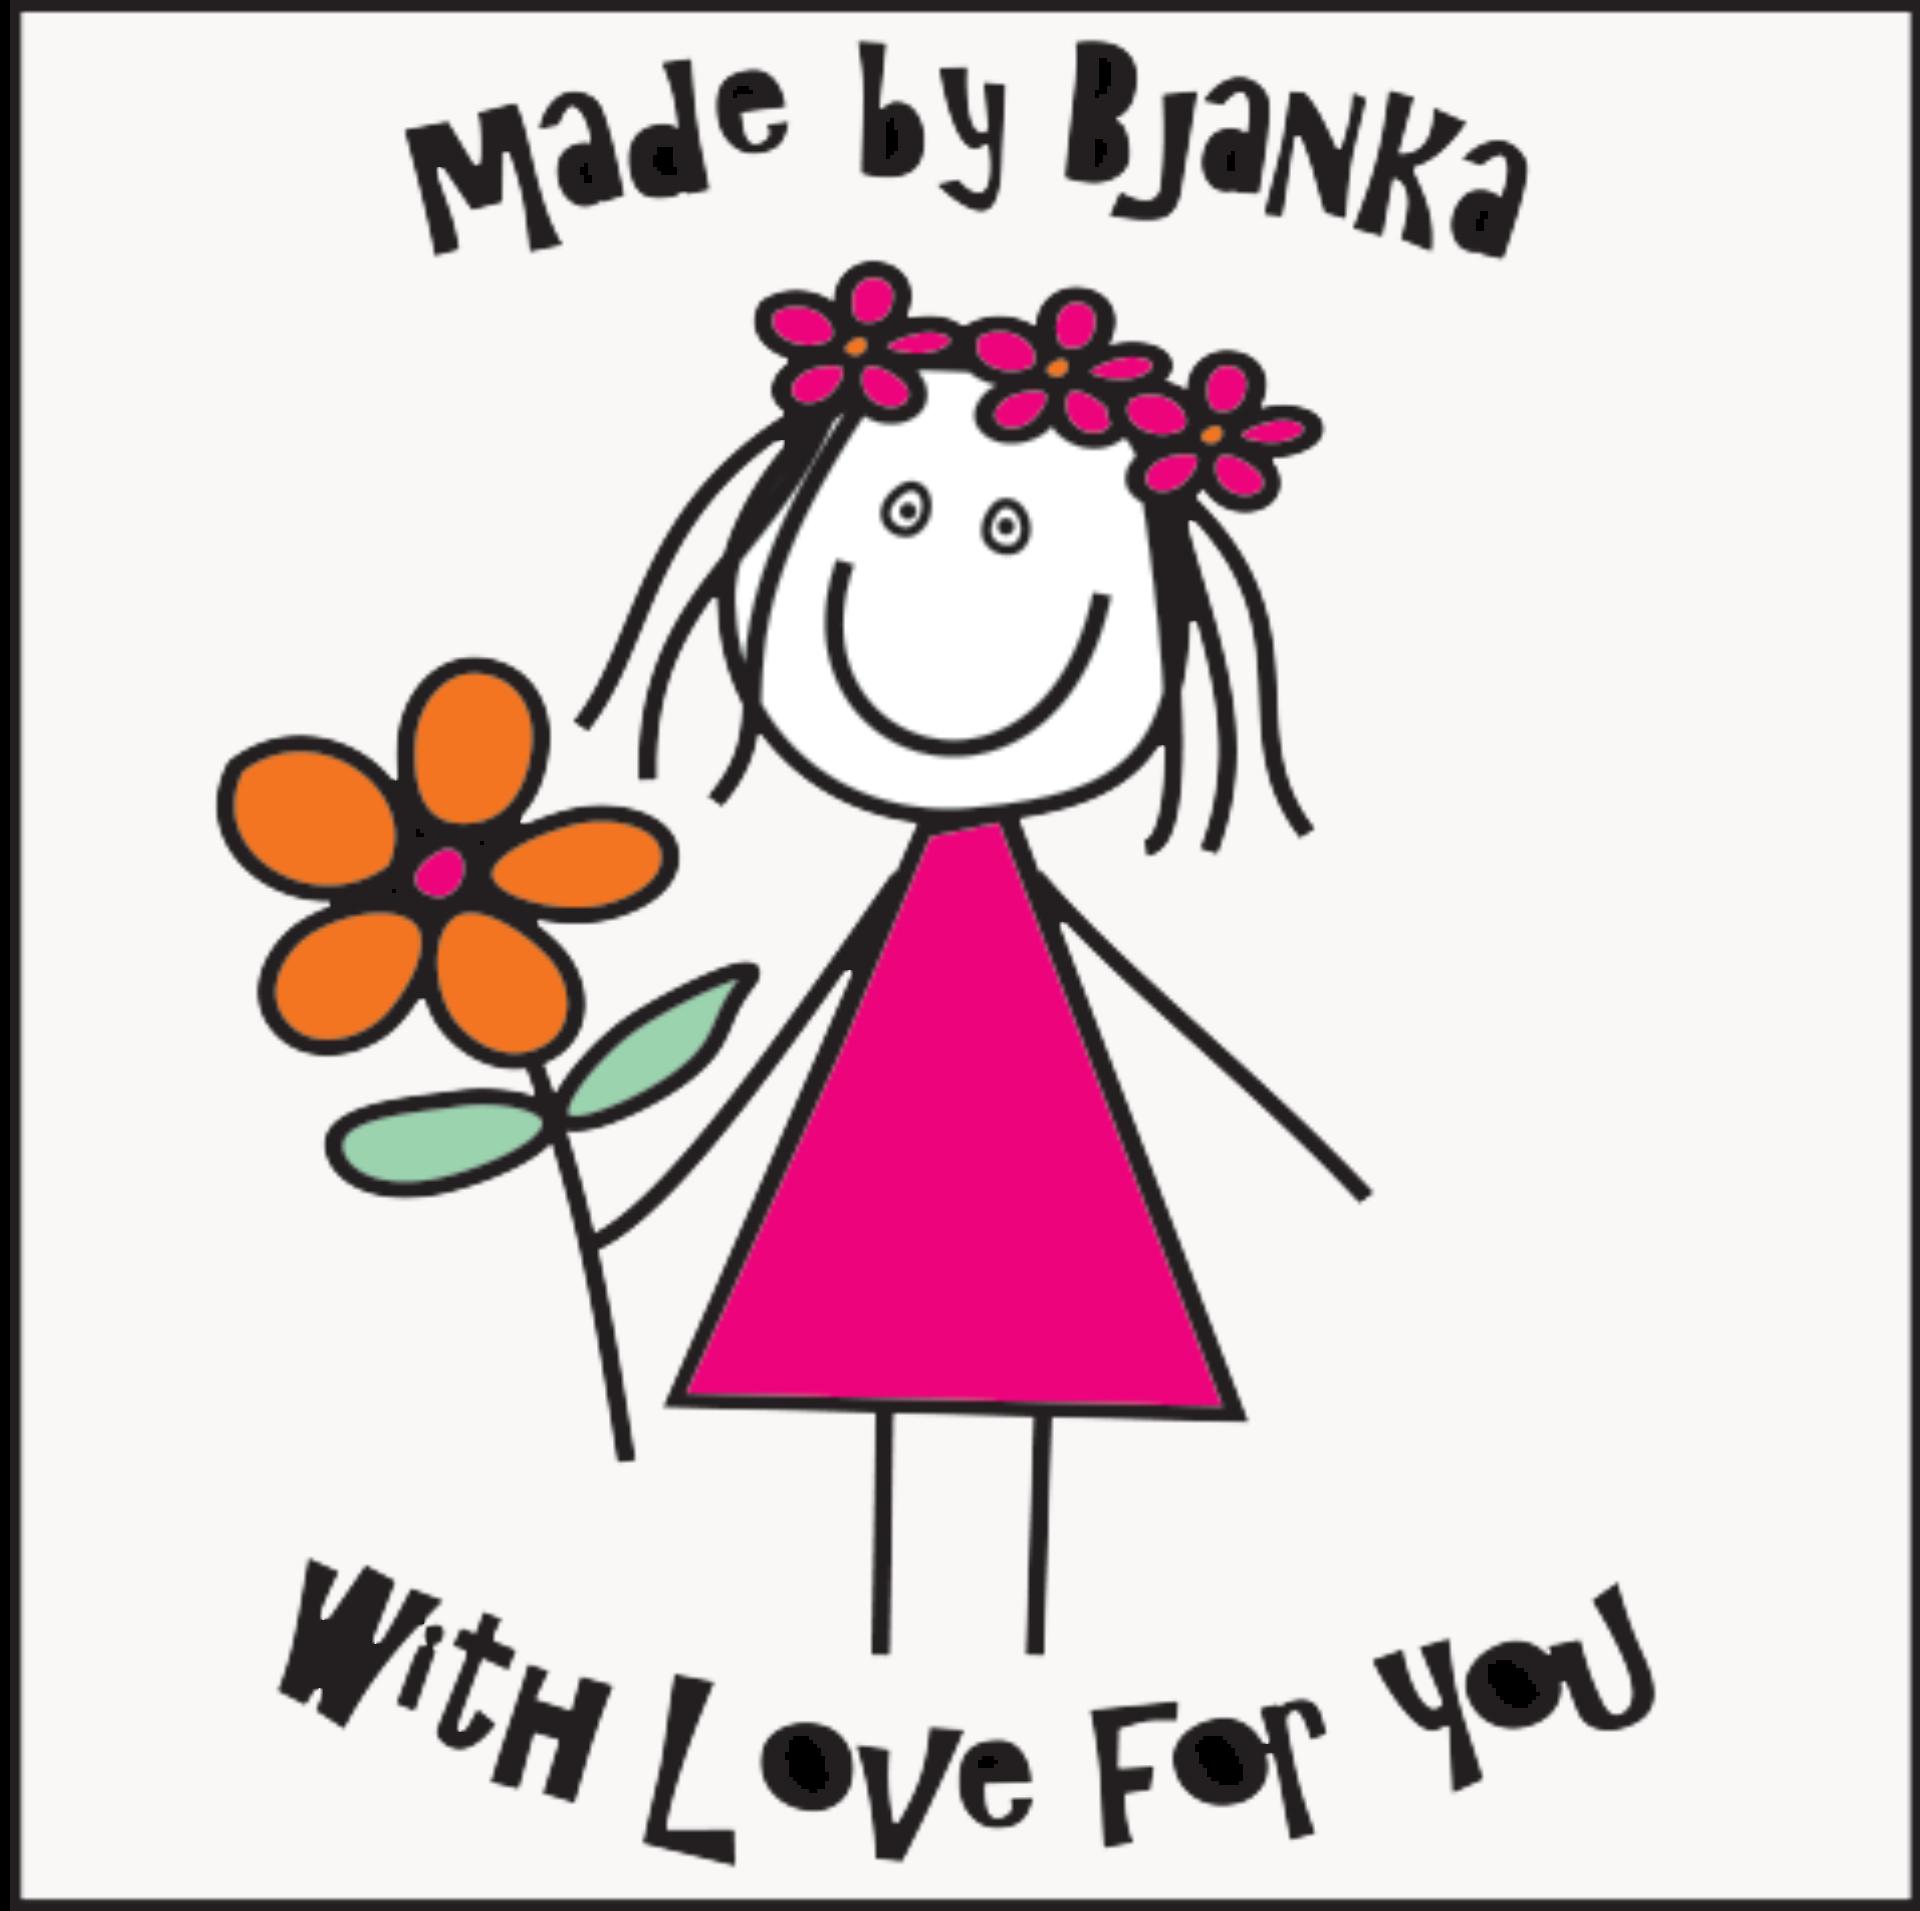 Made by Bjanka